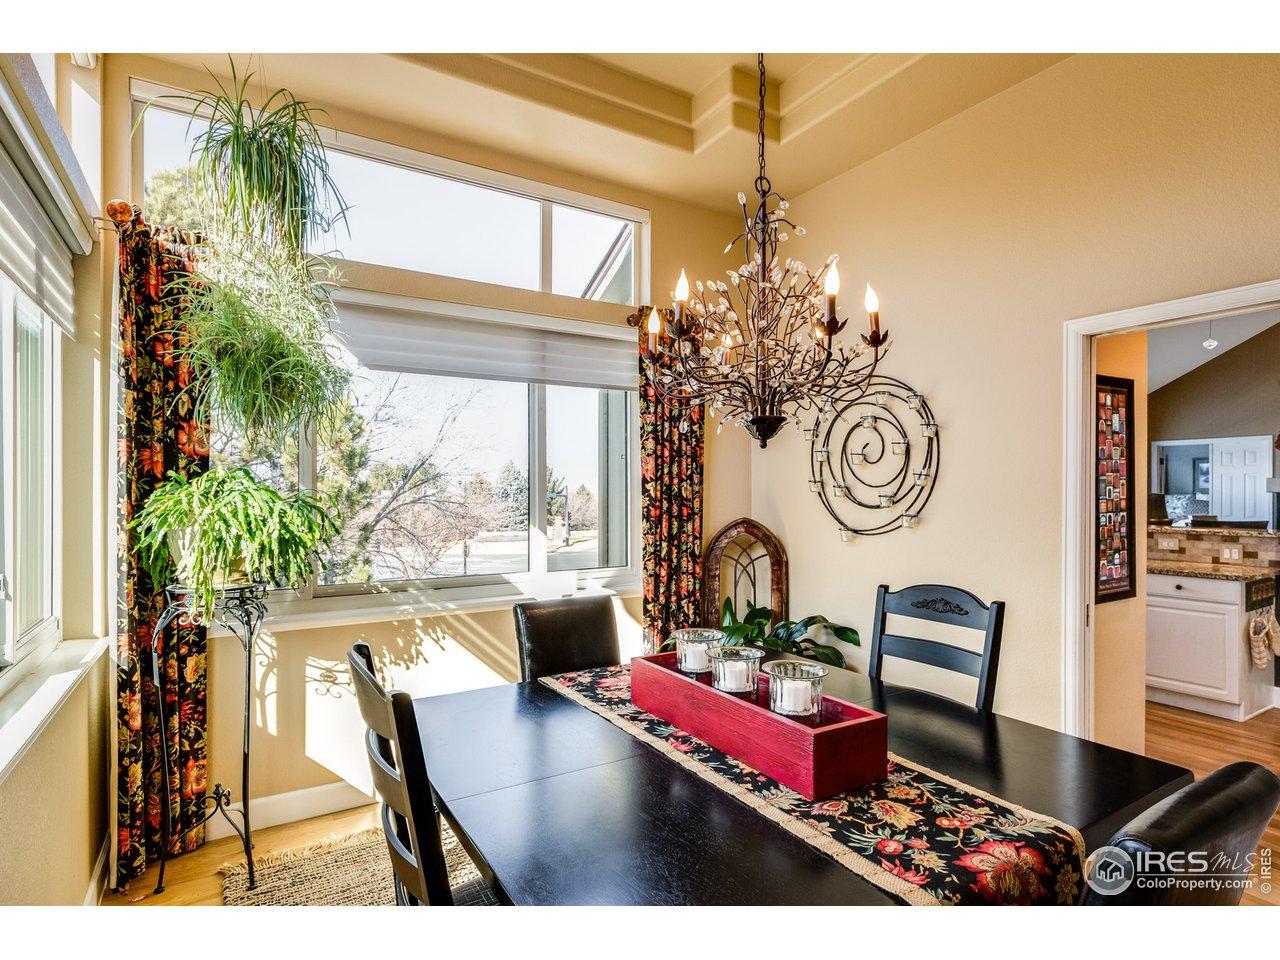 Dining Area - Great Light